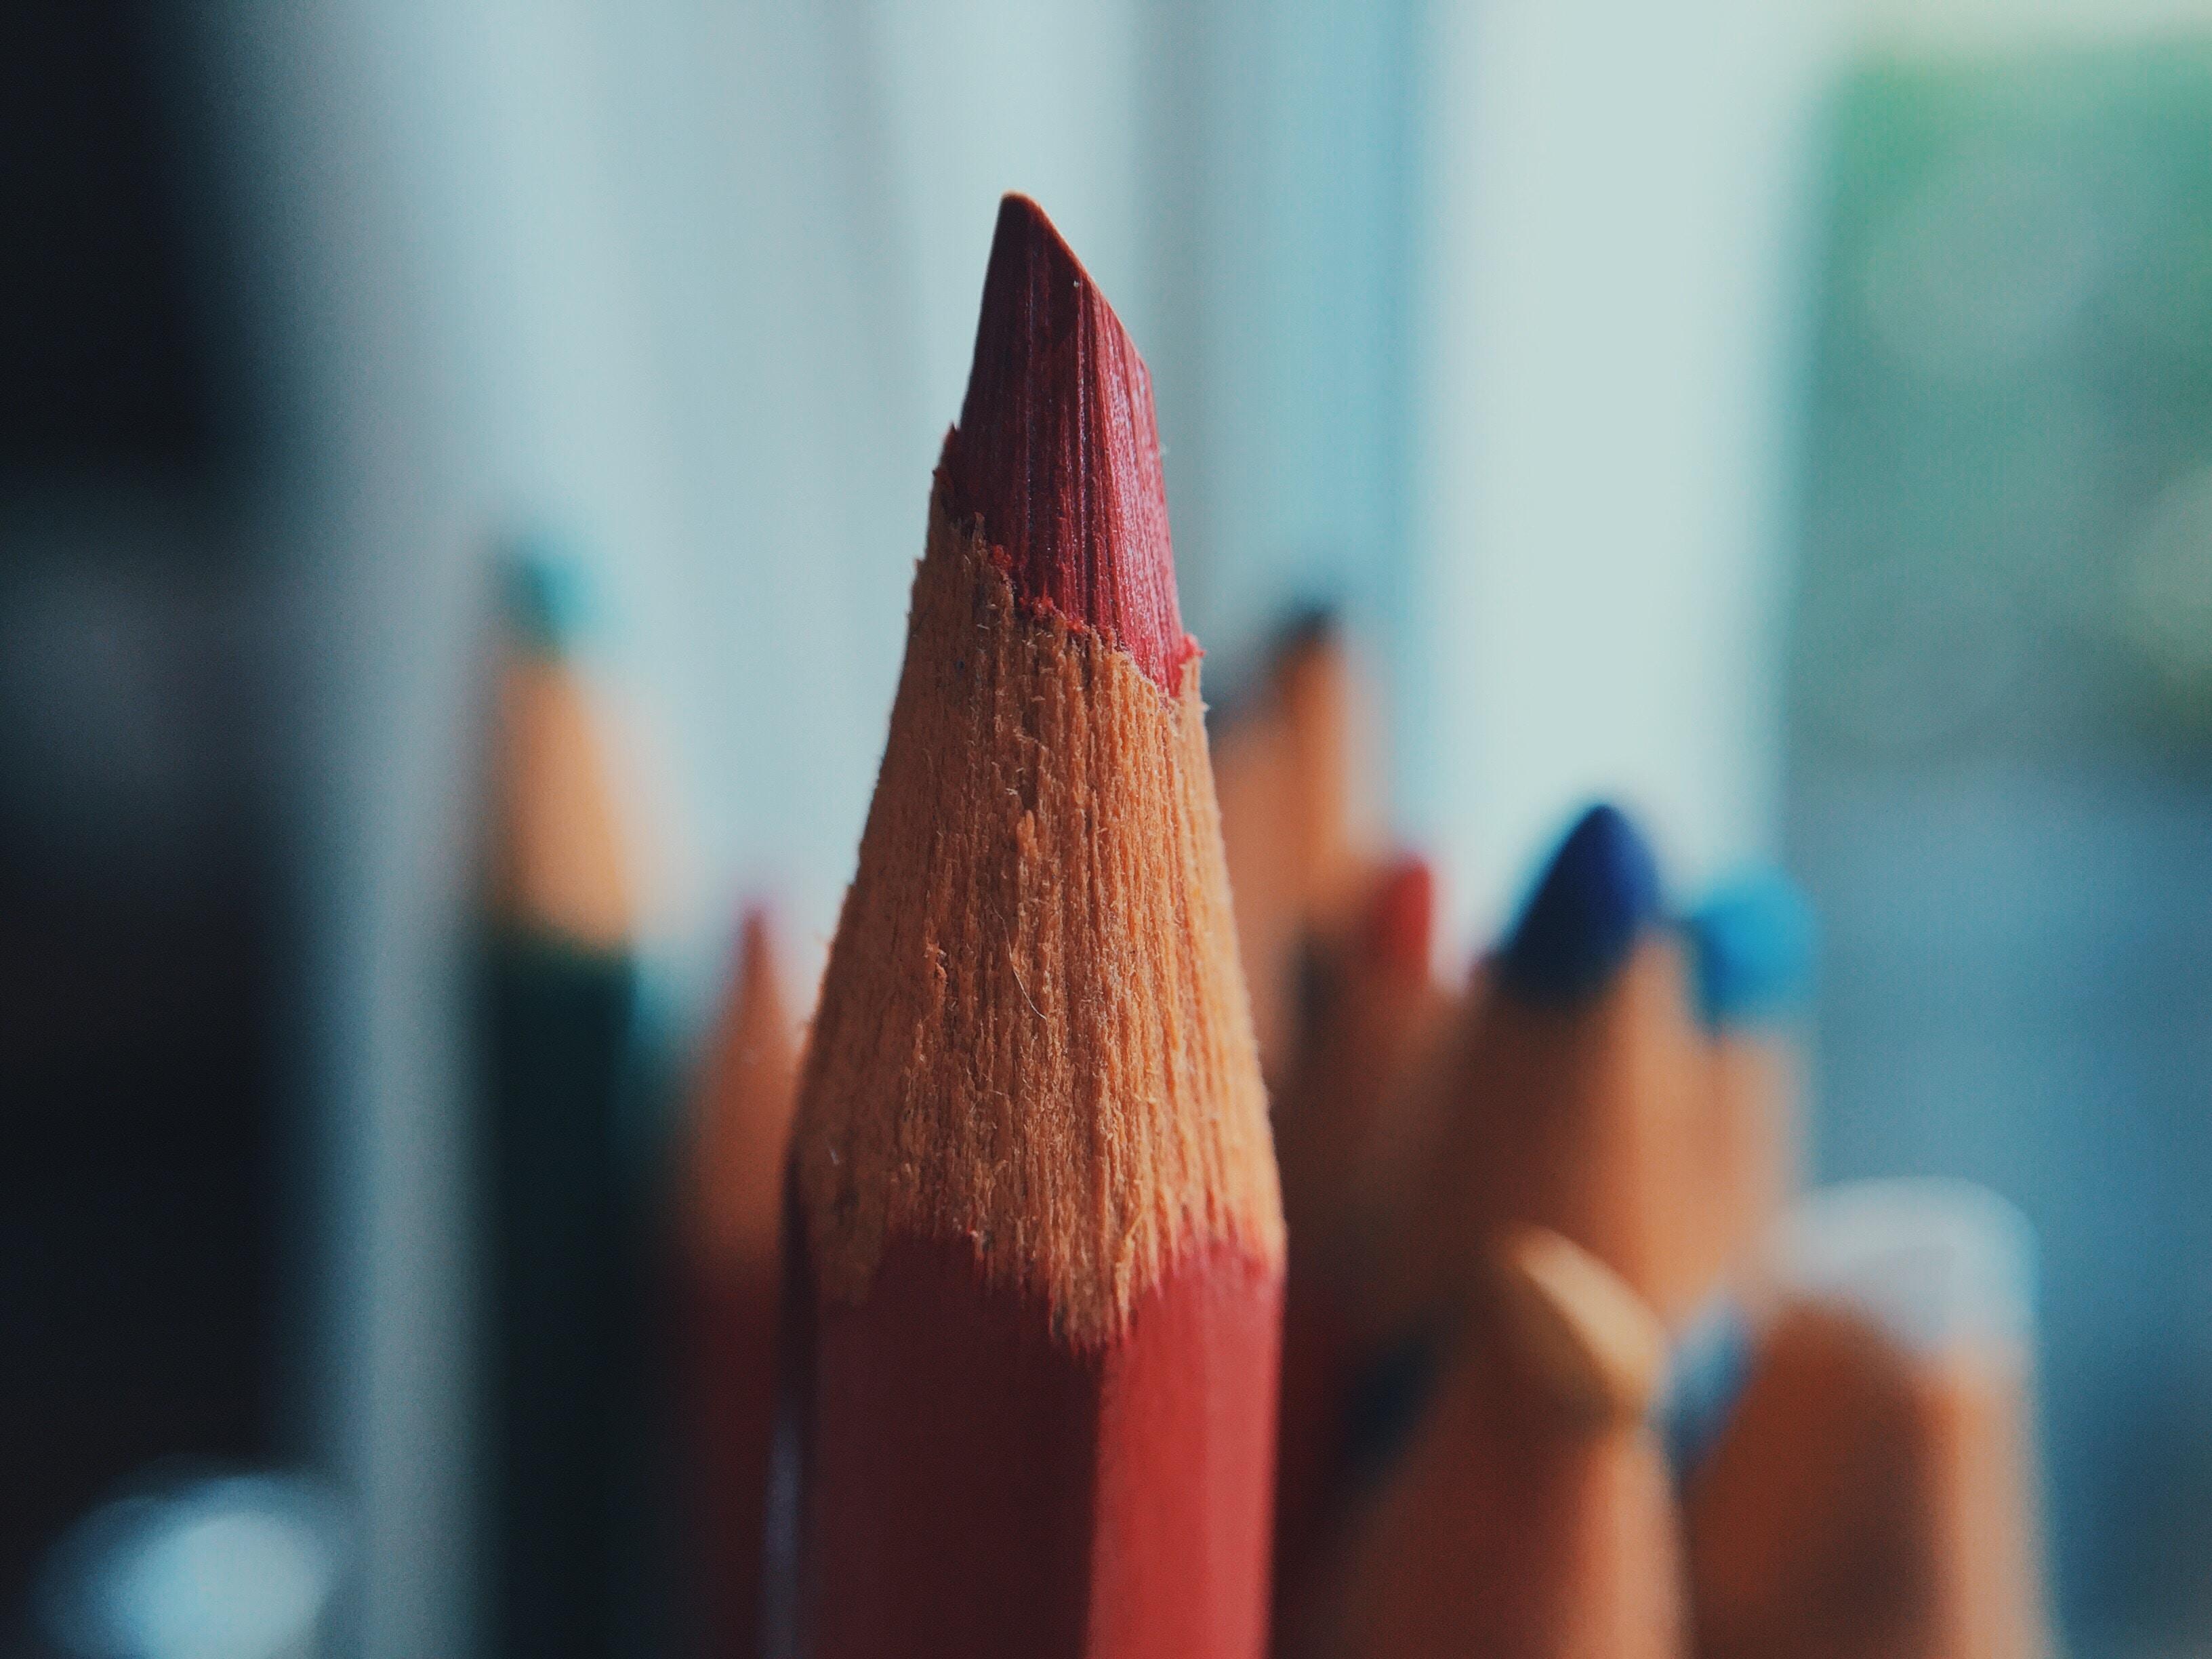 Pencil stories